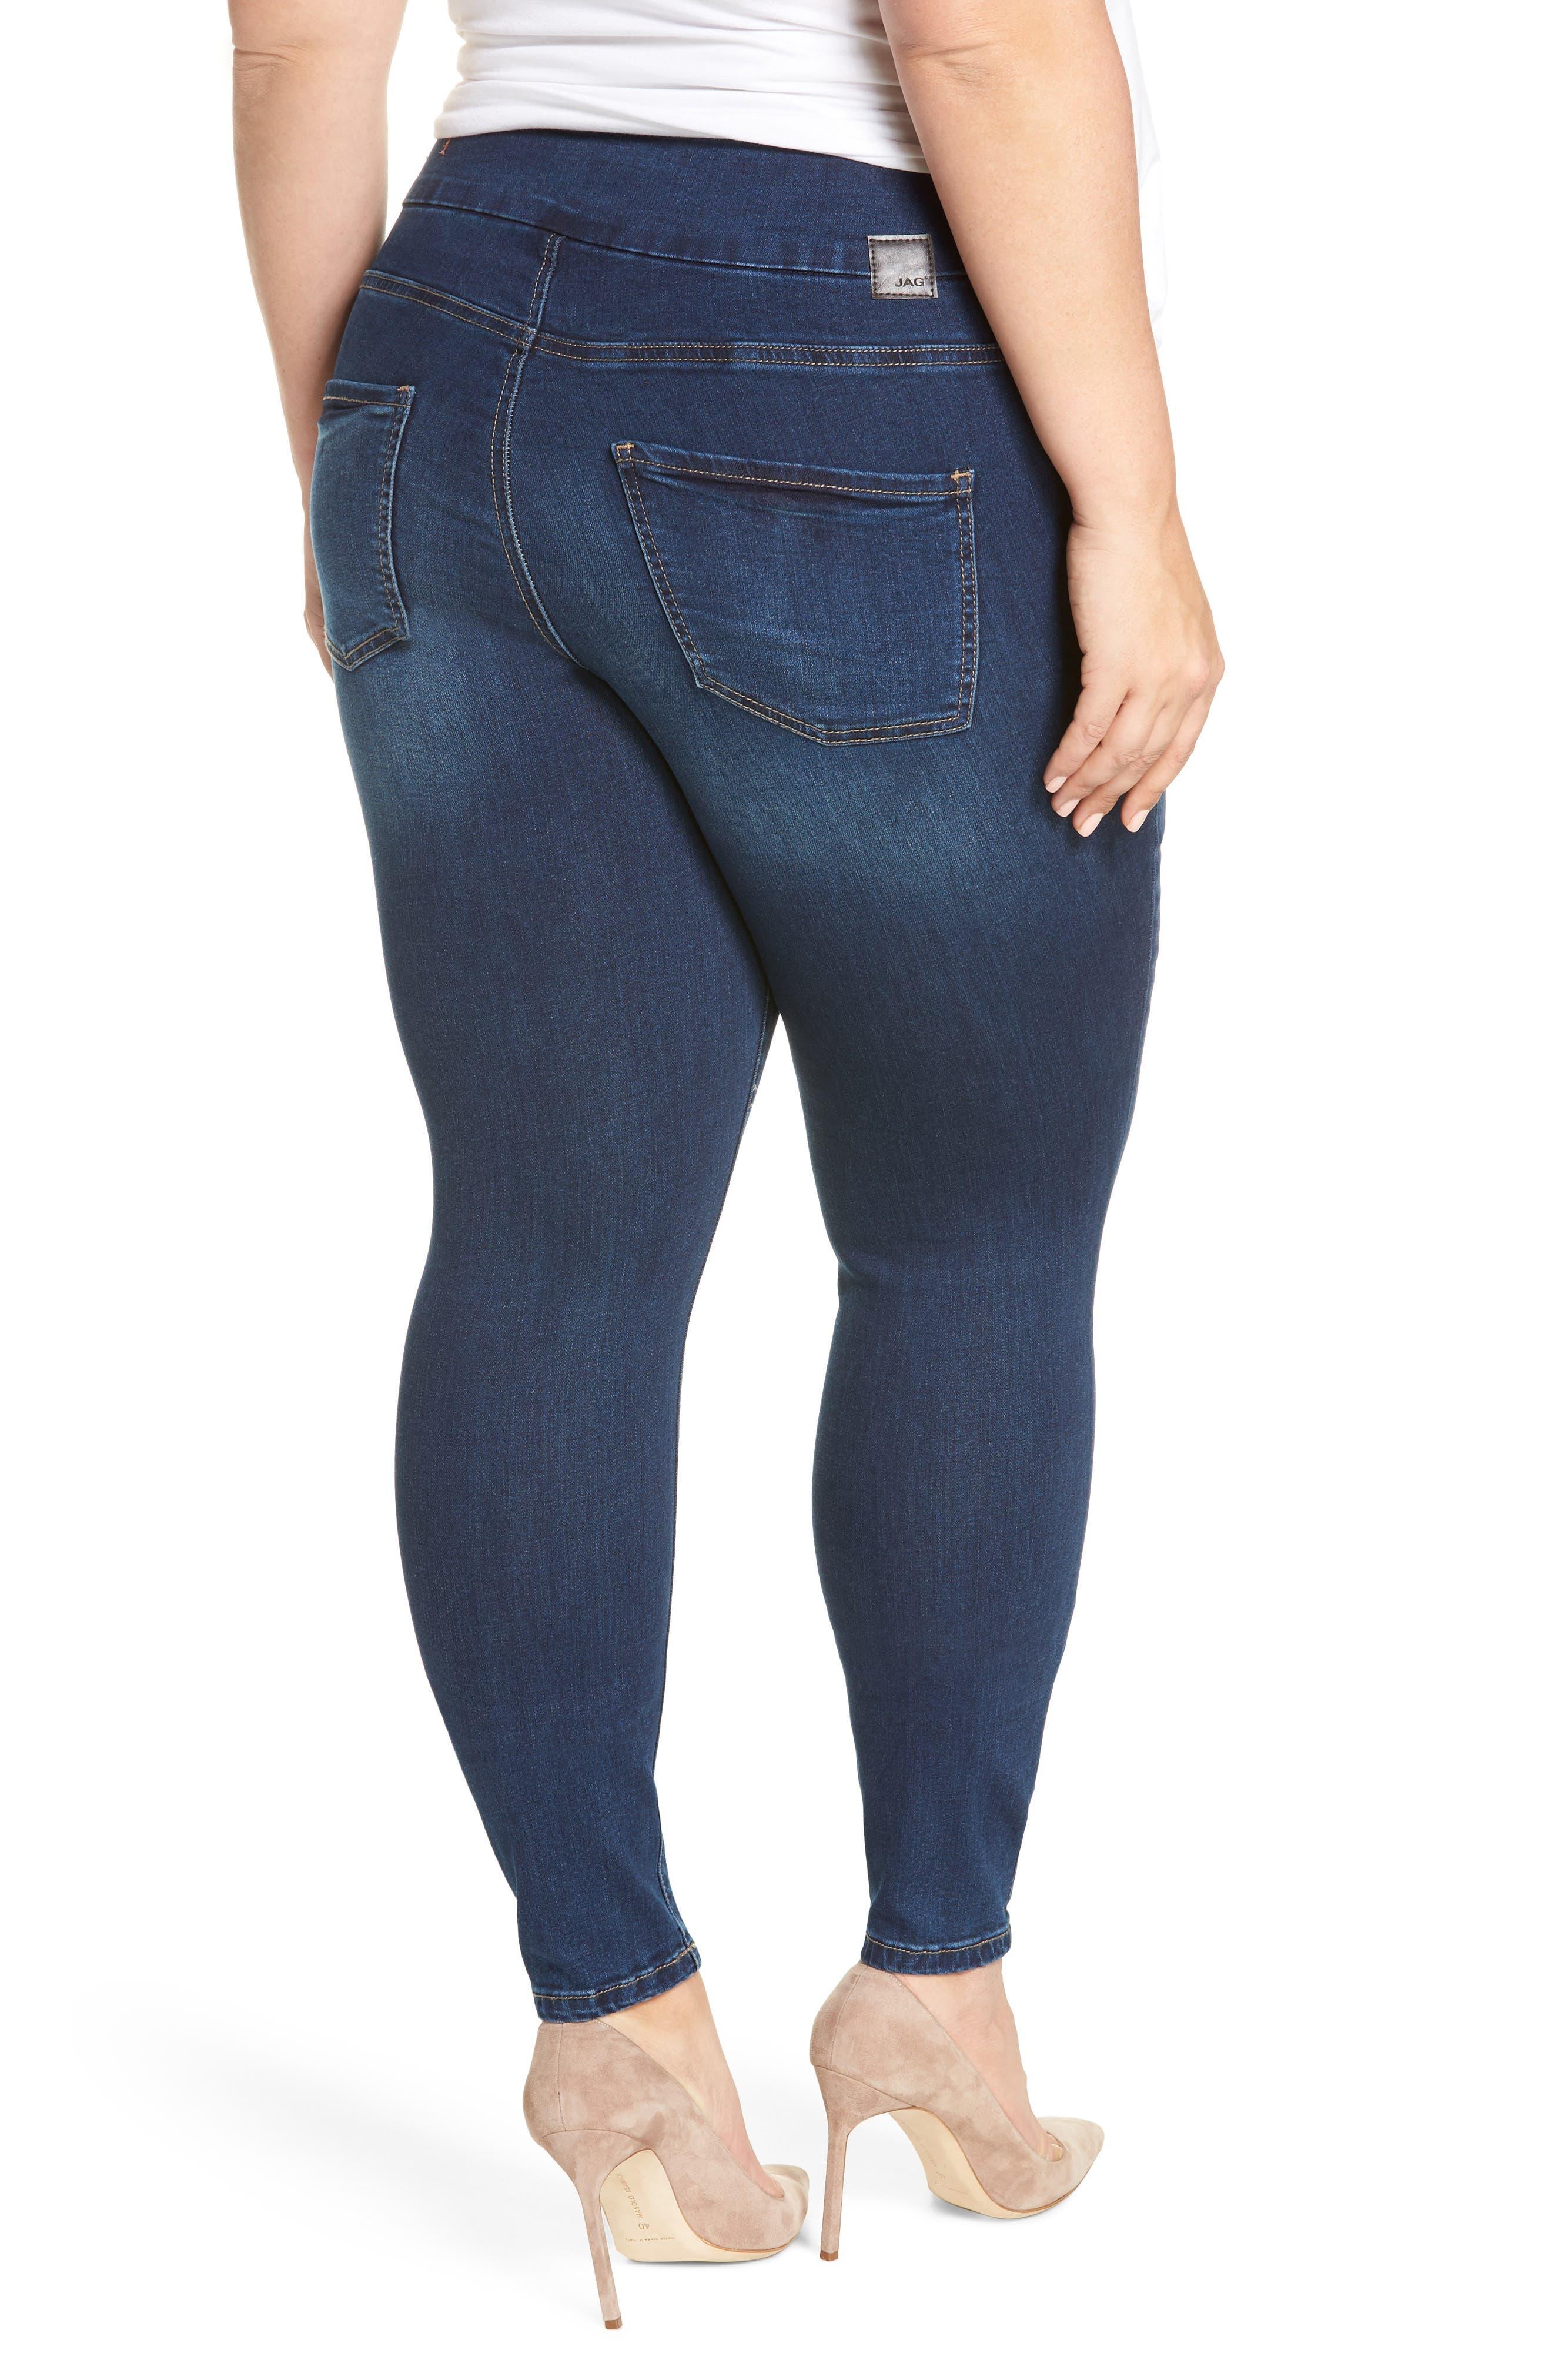 Nora Stretch Skinny Jeans,                             Alternate thumbnail 2, color,                             MED INDIGO